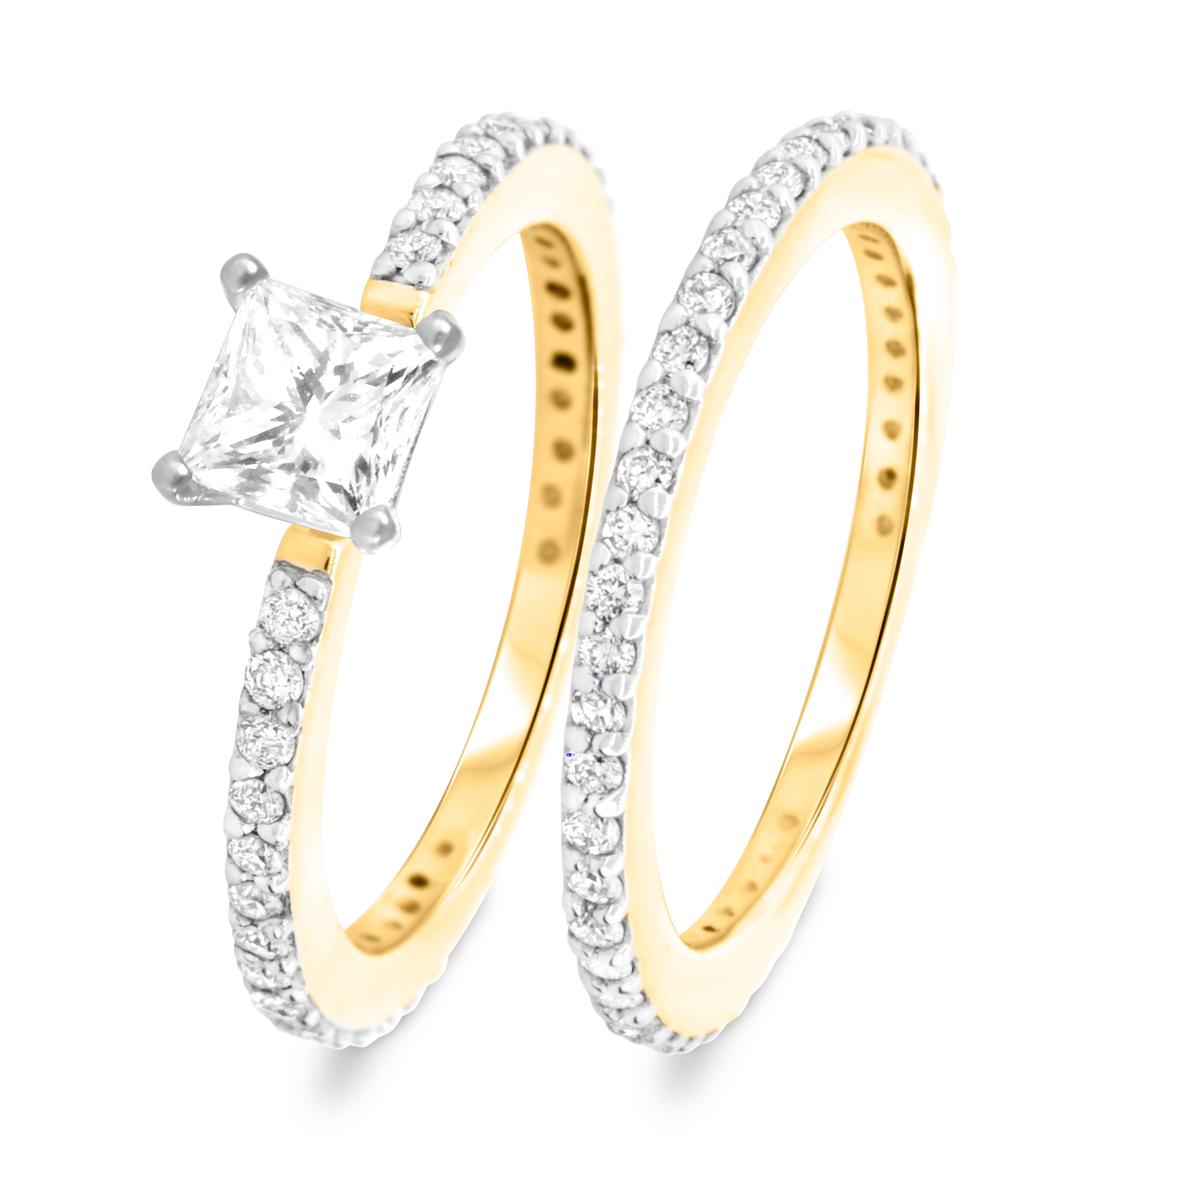 1 2/3 CT. T.W. Diamond Women's Bridal Wedding Ring Set 14K Yellow Gold